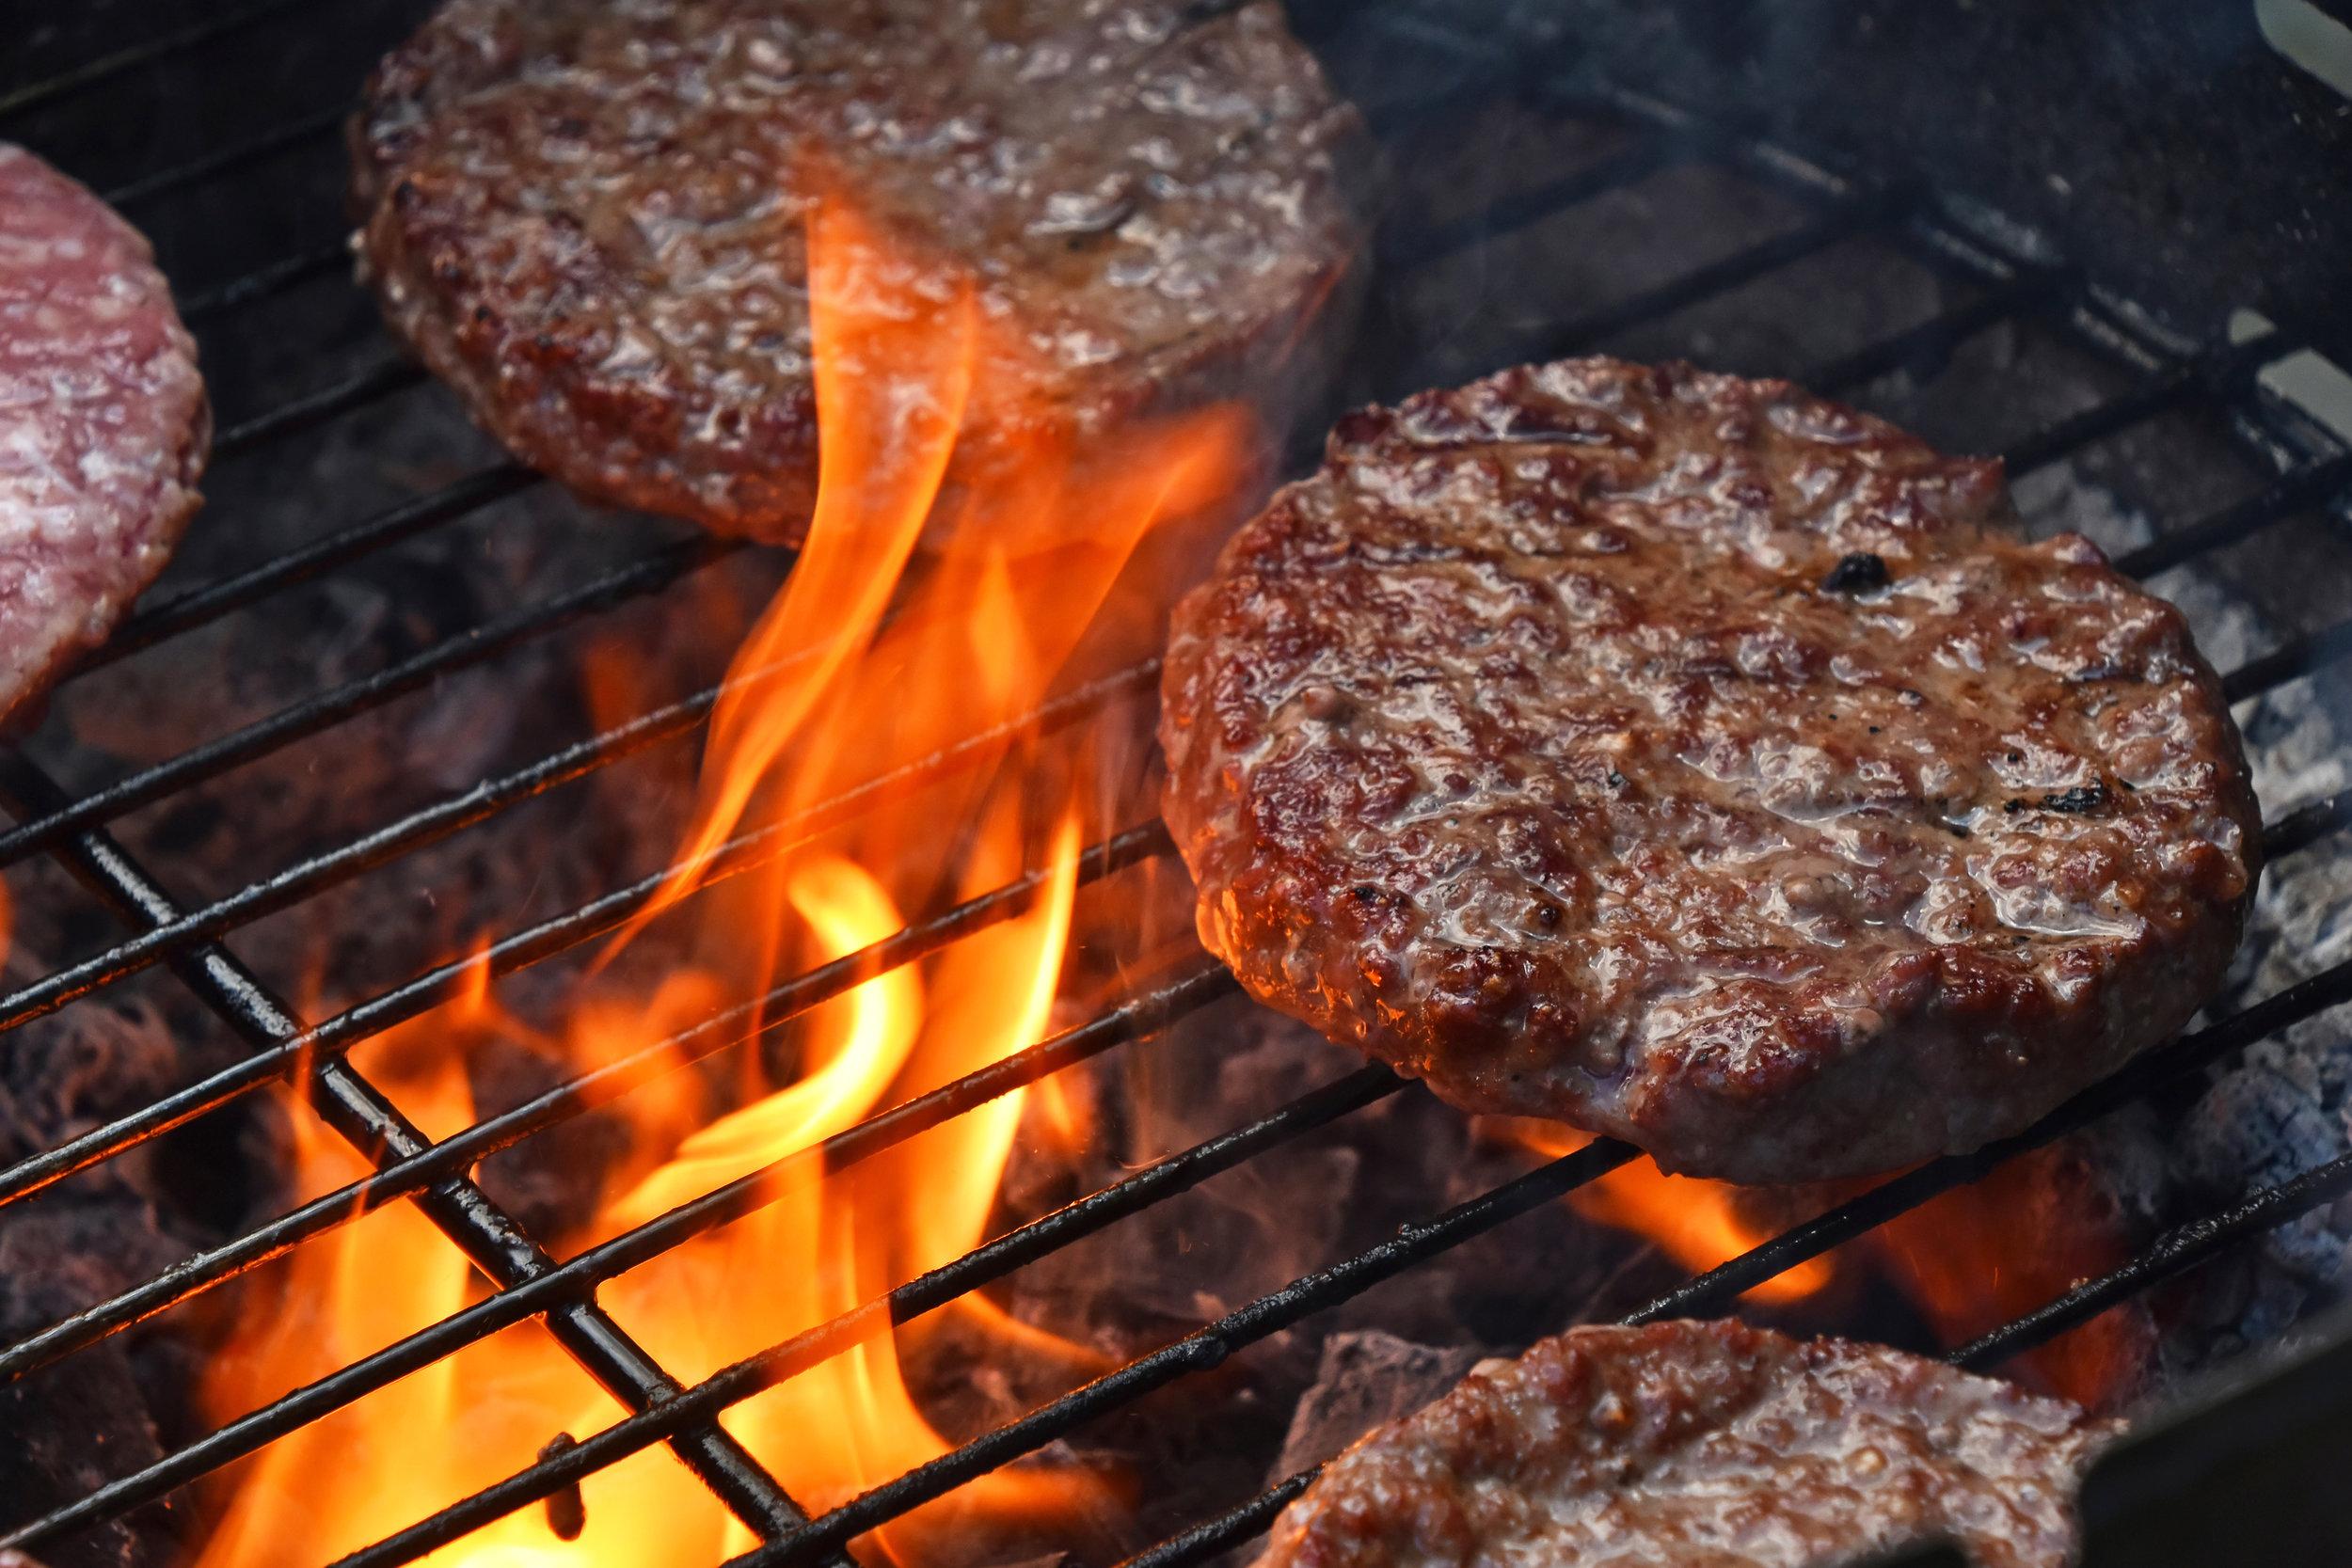 bigstock-Meat-Burgers-For-Hamburger-Gri-133589000.jpg